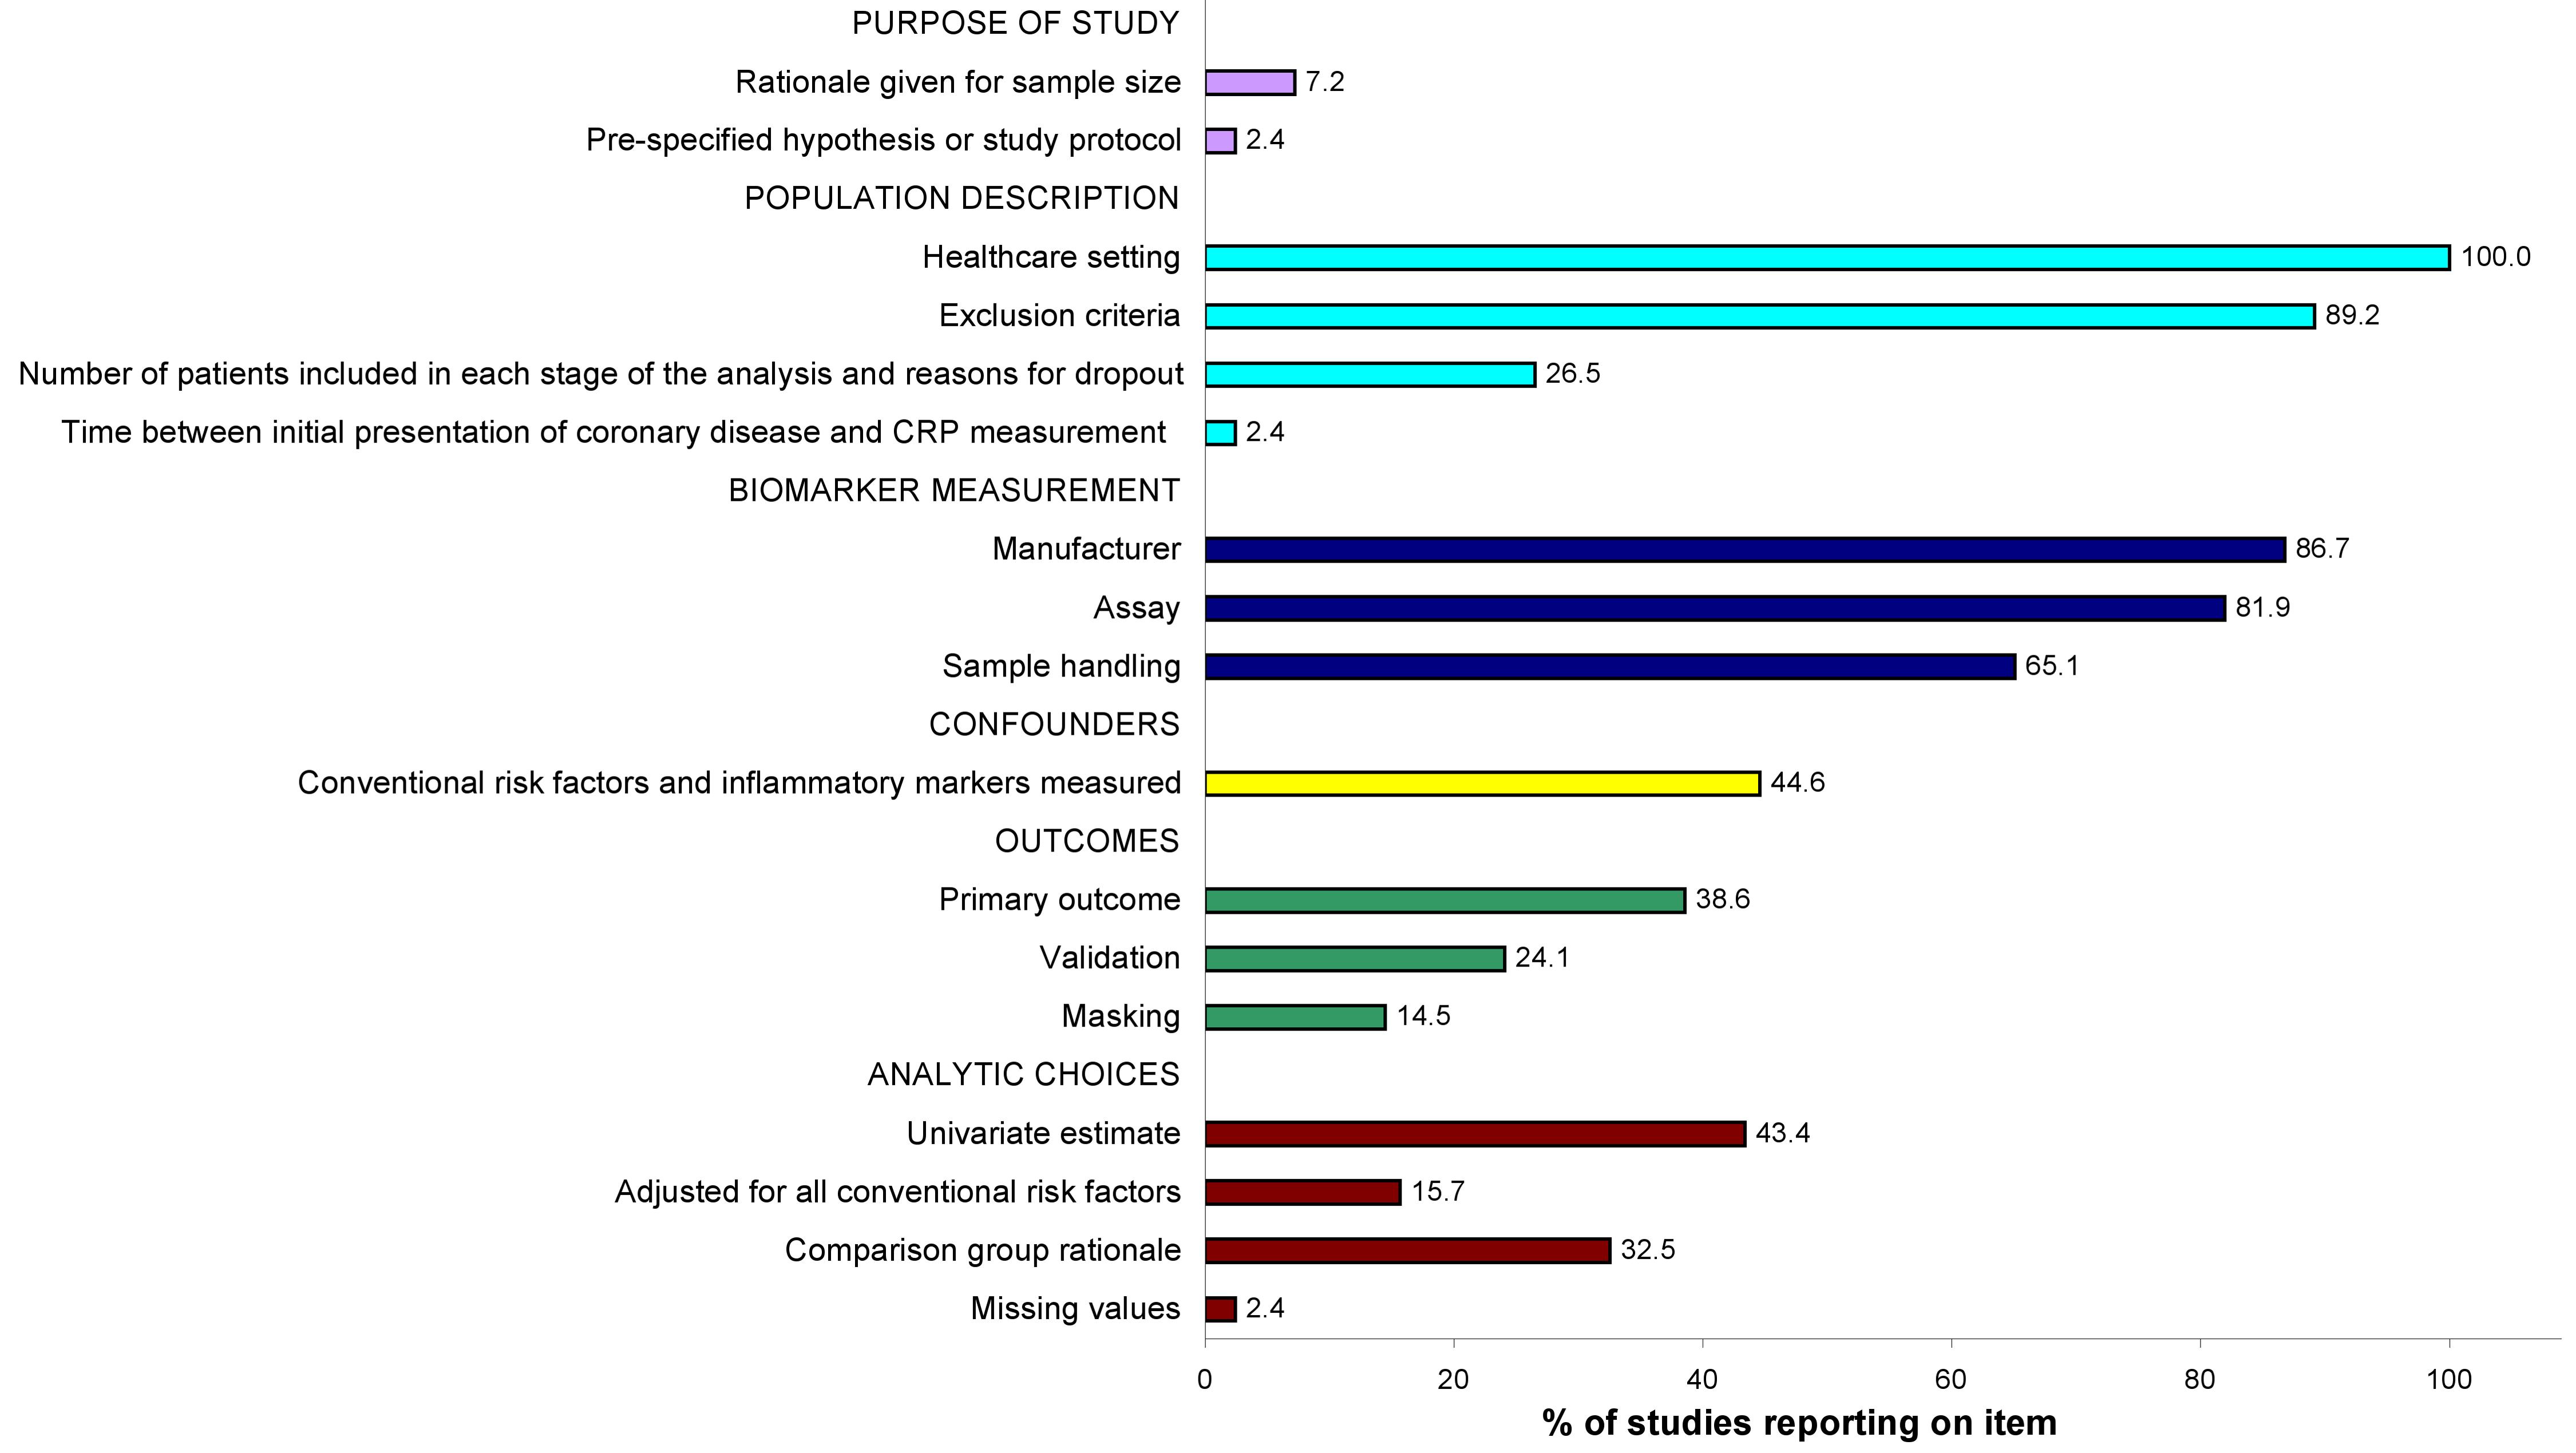 Quality of individual study reports (<i>n=</i>17 items, <i>n=</i>83 studies), based on the REMARK guidelines <em class=&quot;ref&quot;>[<b>11</b>]</em>.